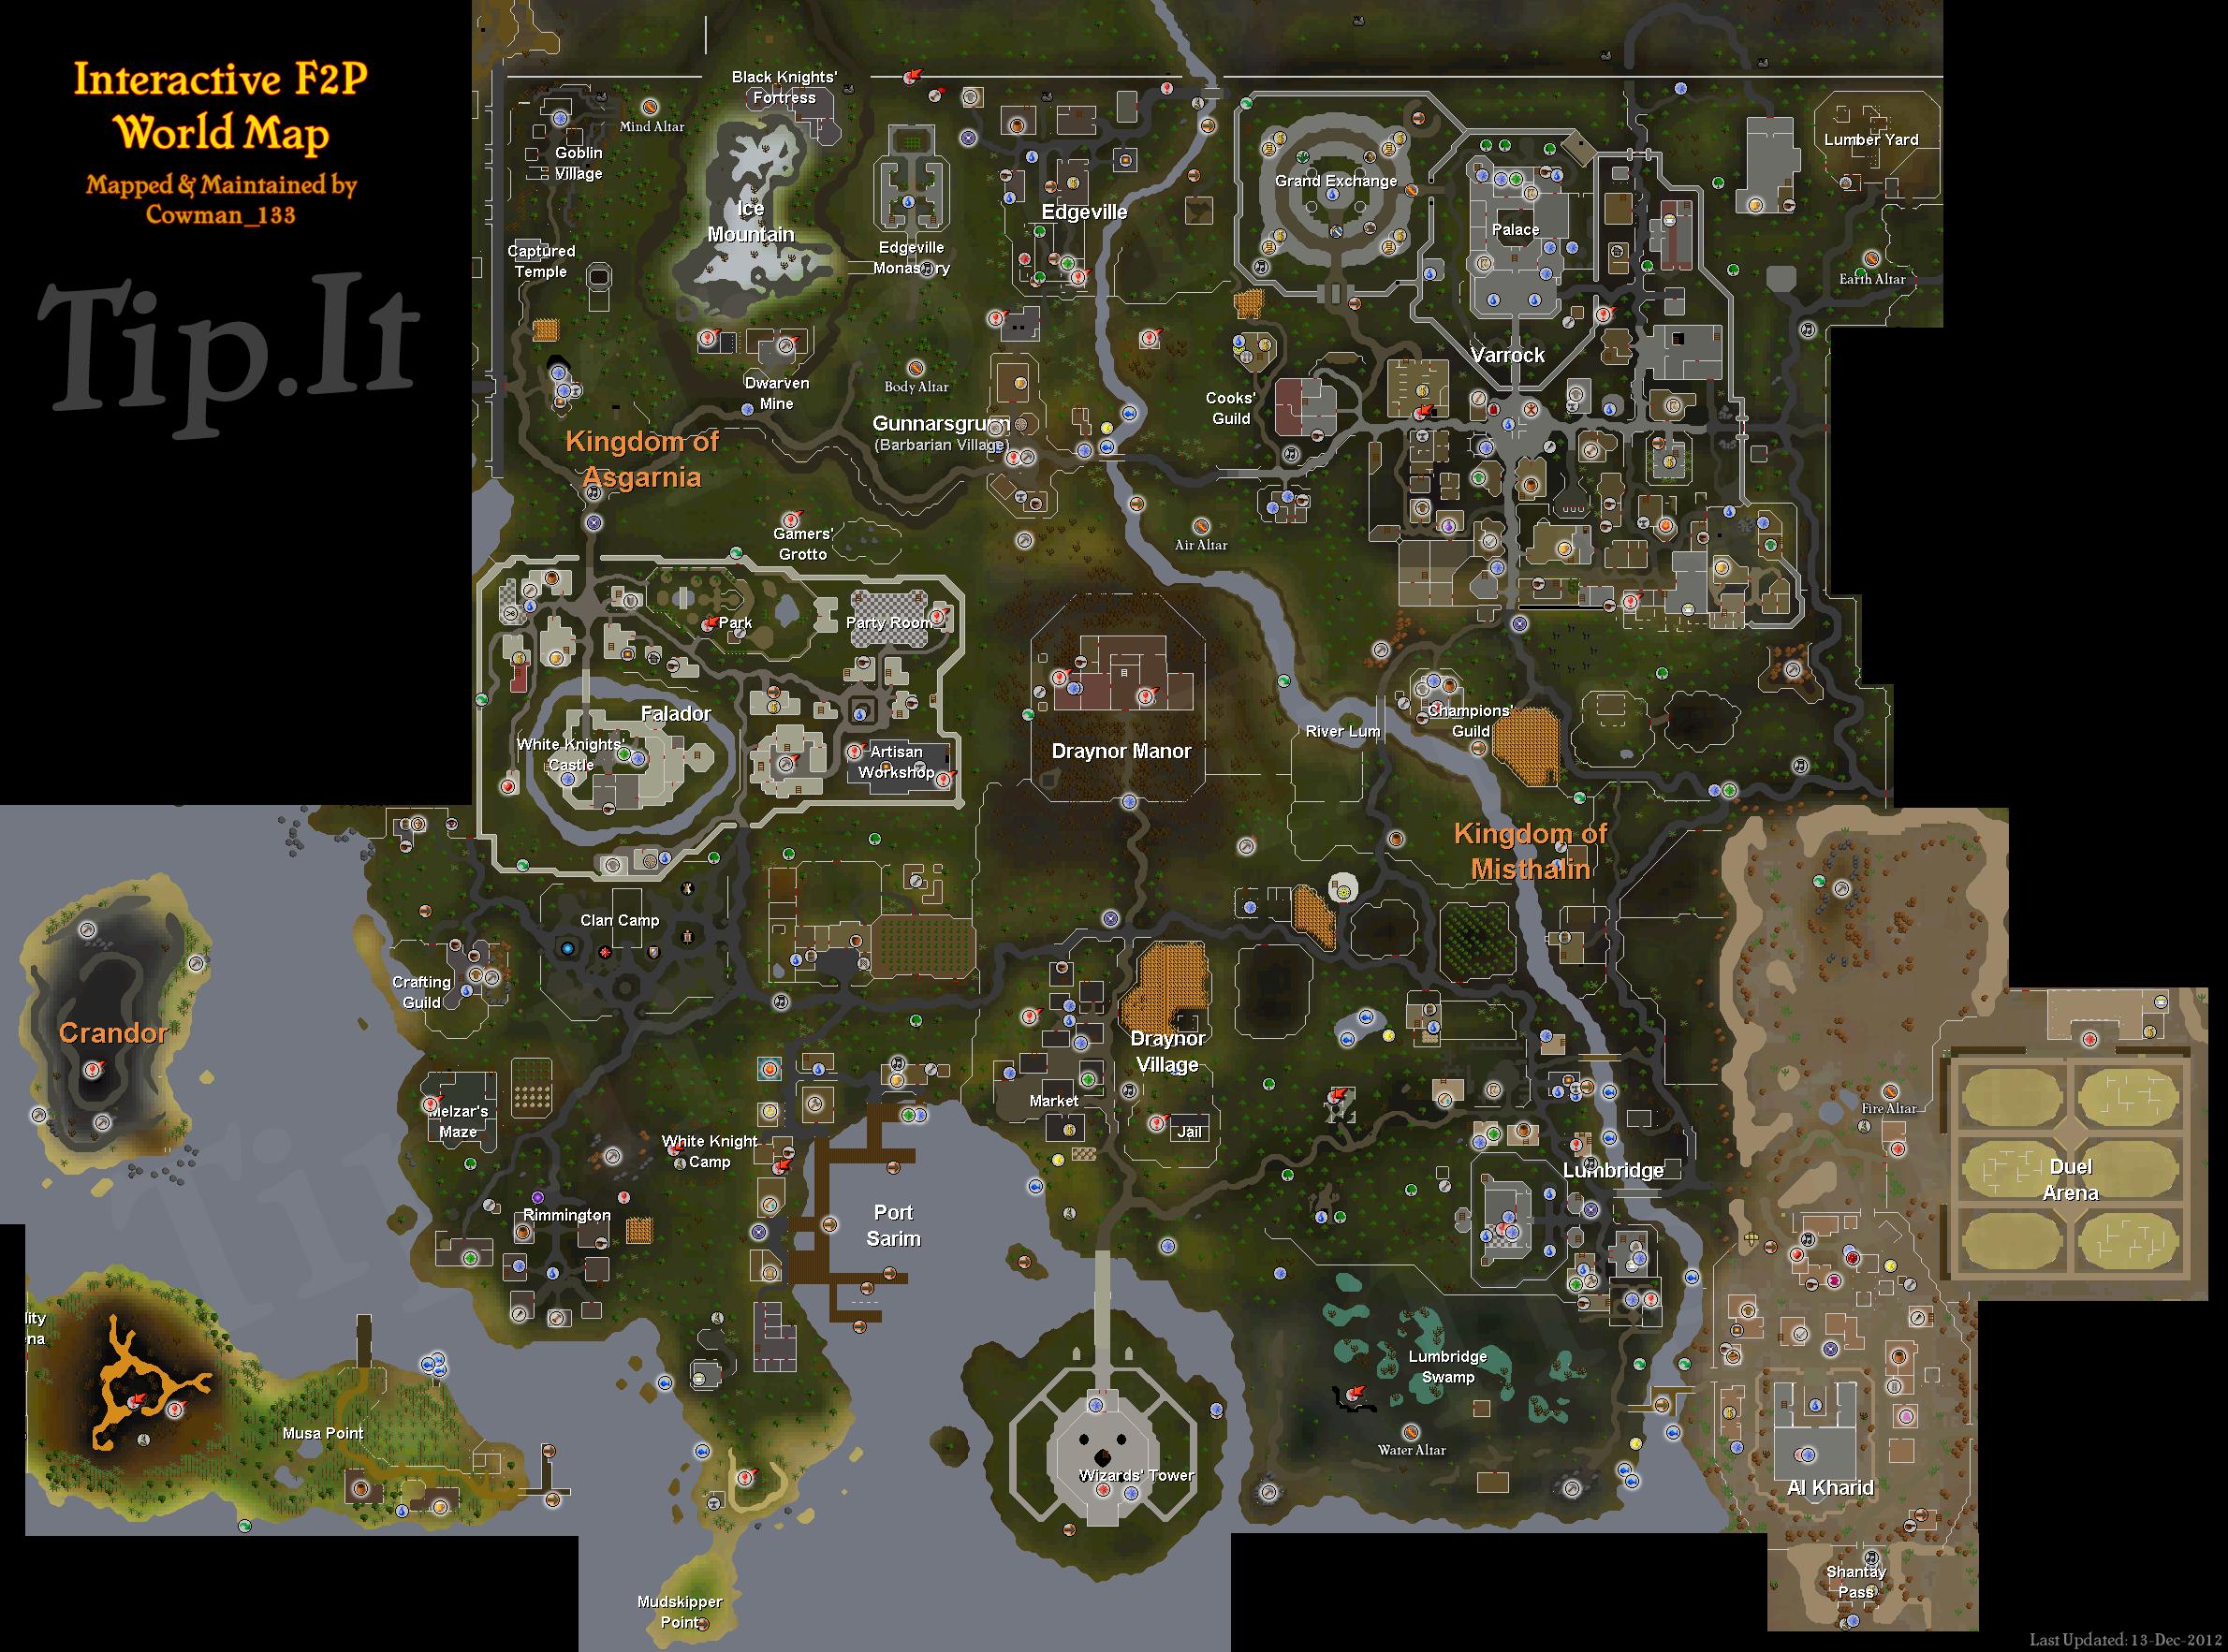 Fp World Map